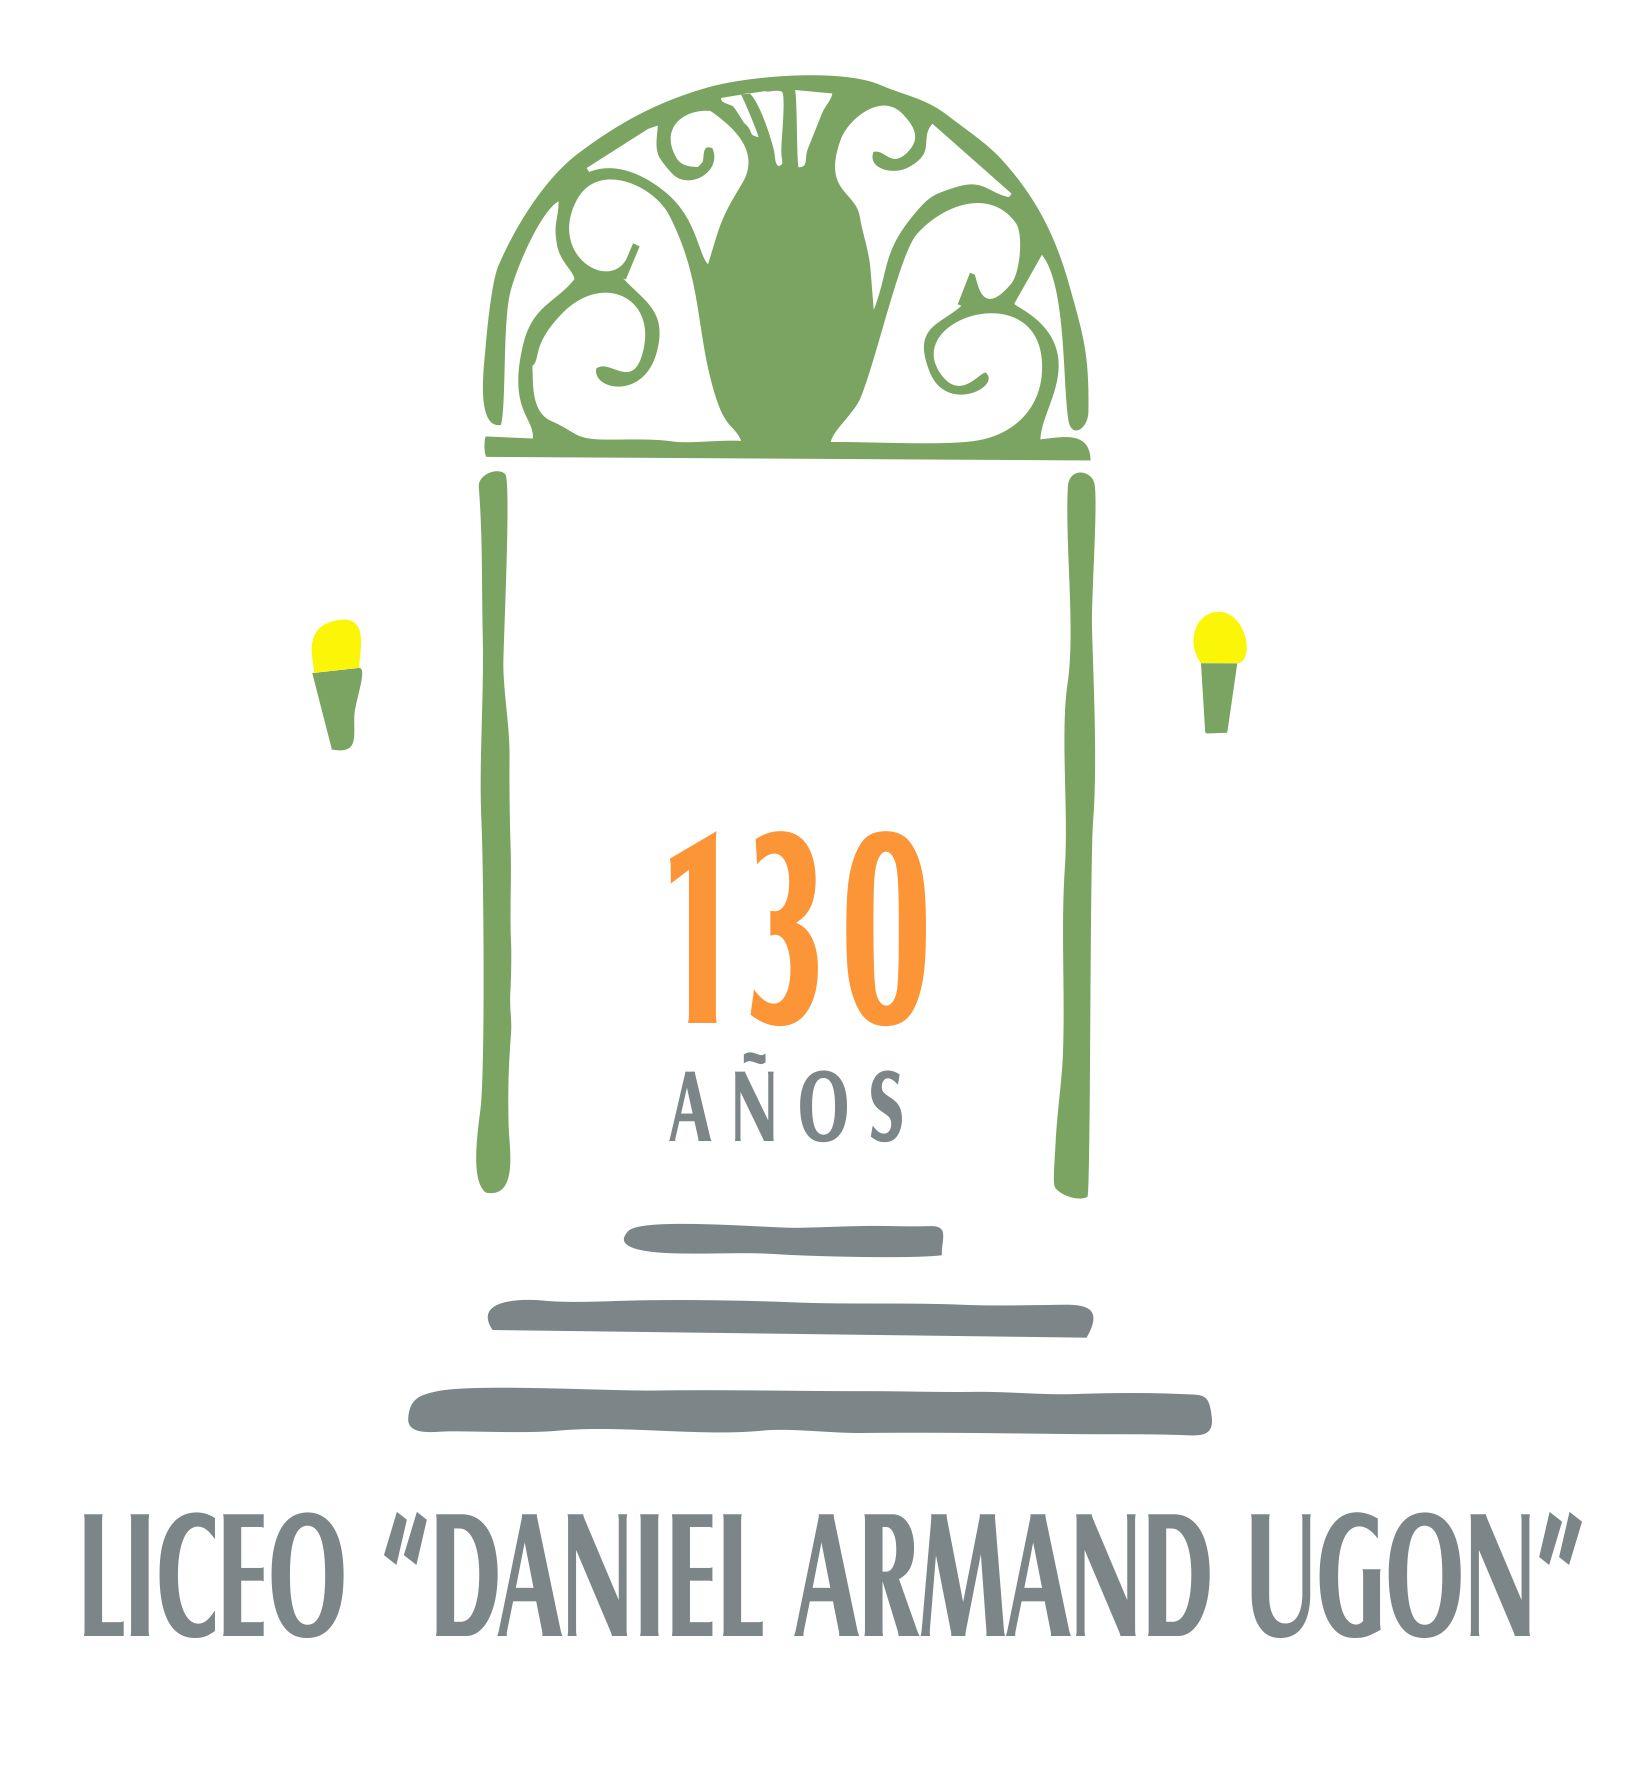 Liceo Daniel Armand Ugon